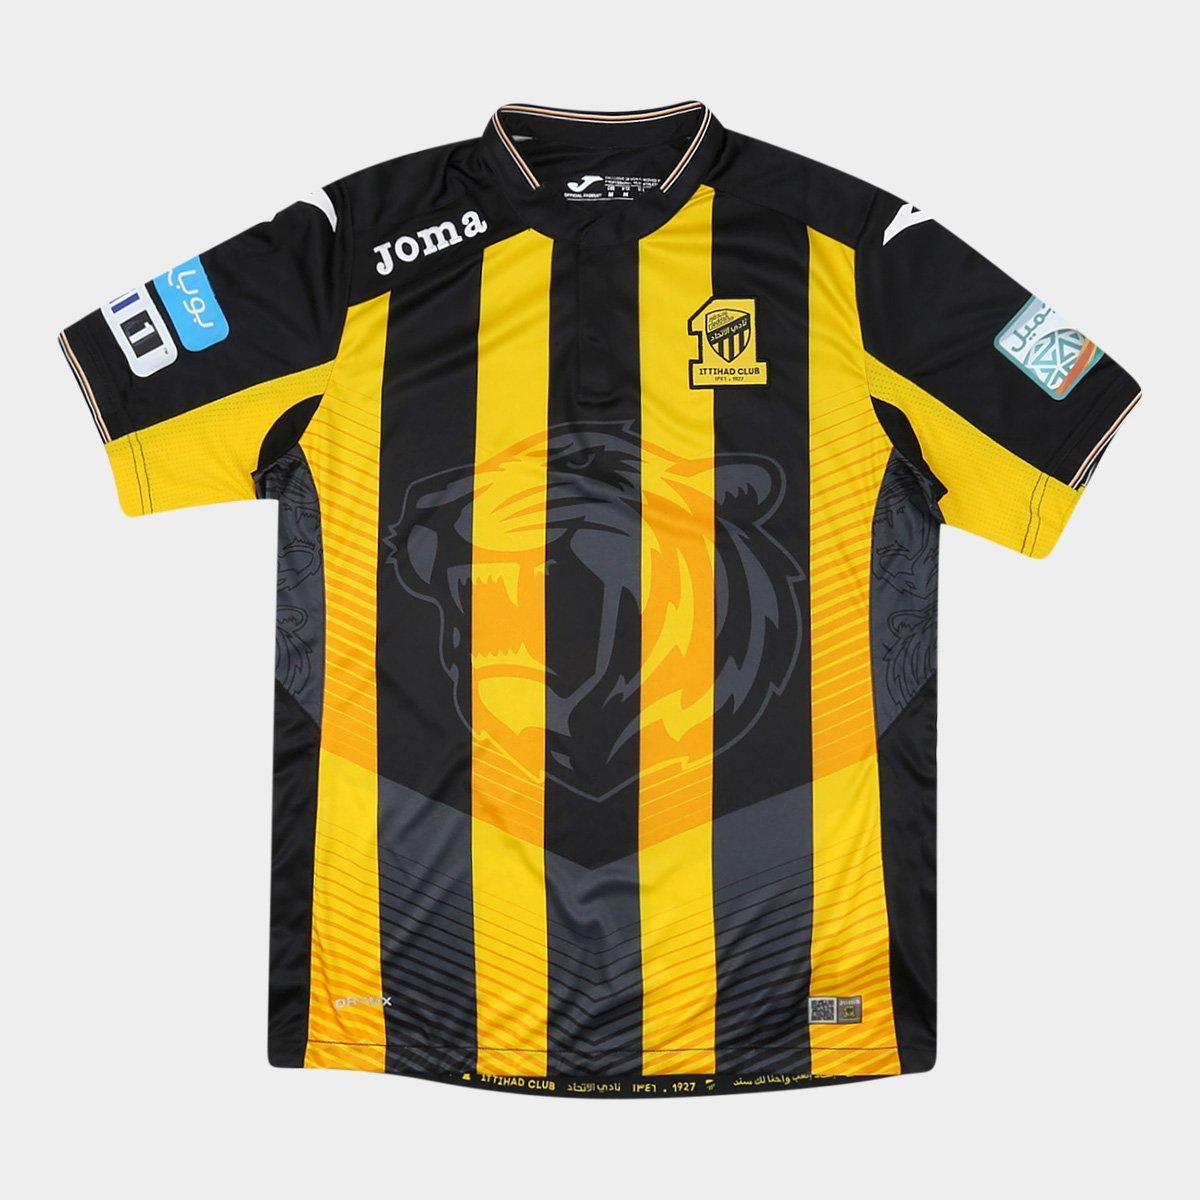 720c5d9a06 Camisa Ittihad Home 2017 s nº Torcedor Joma Masculina - Compre Agora ...